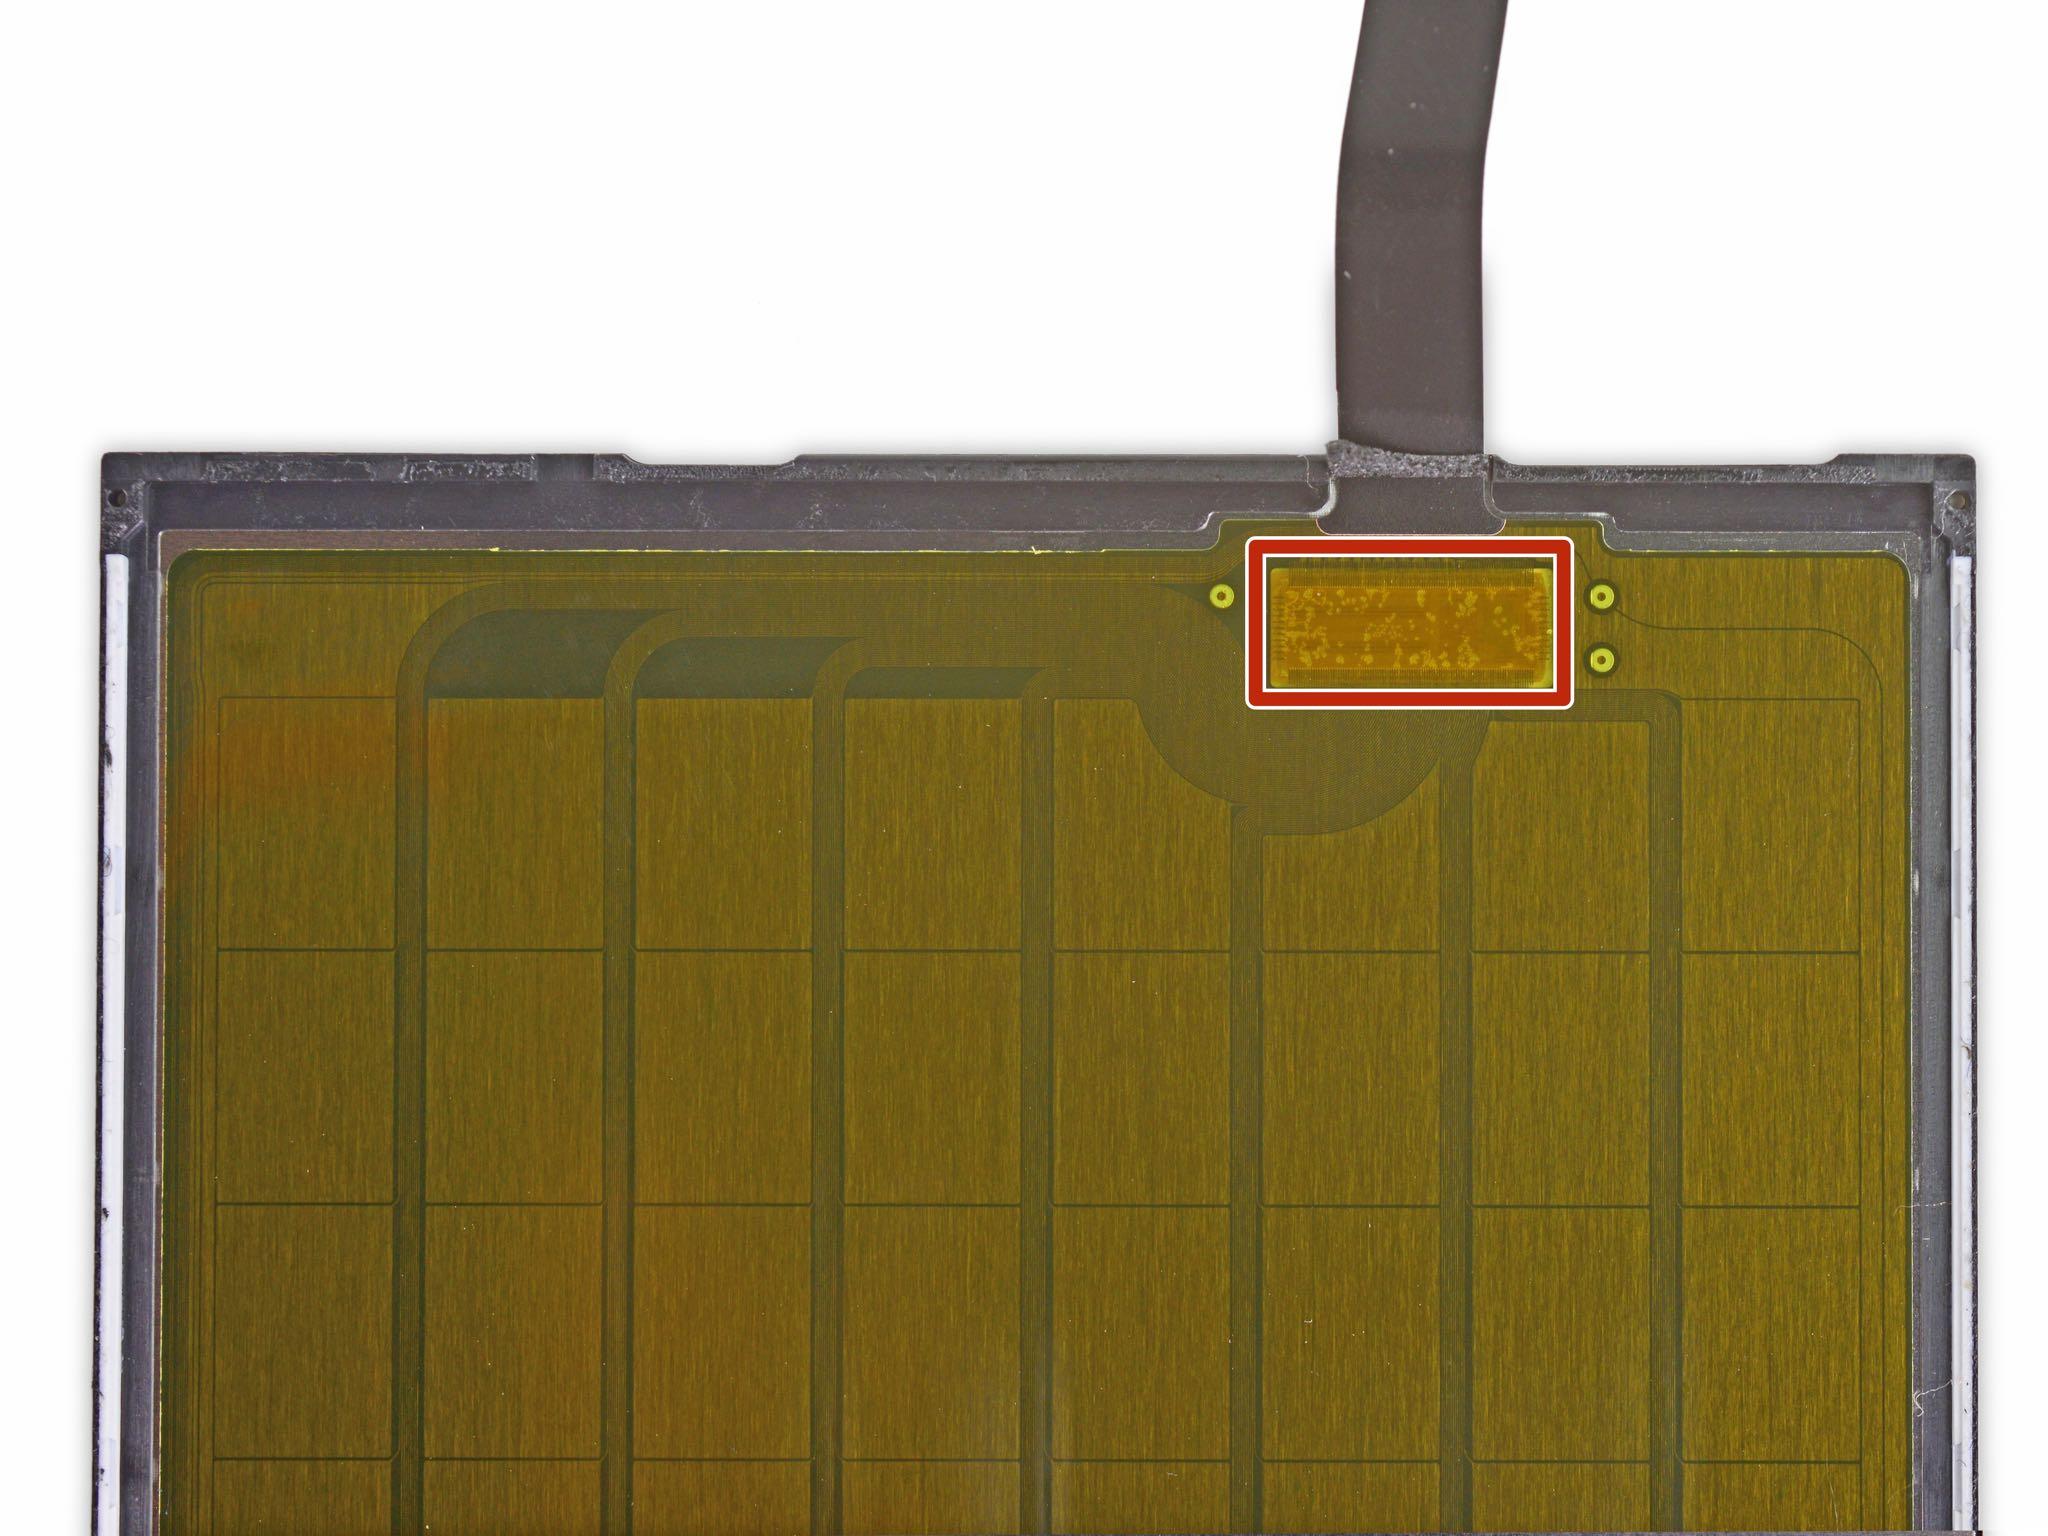 iPhone 6s Display iFixit teardown image 001